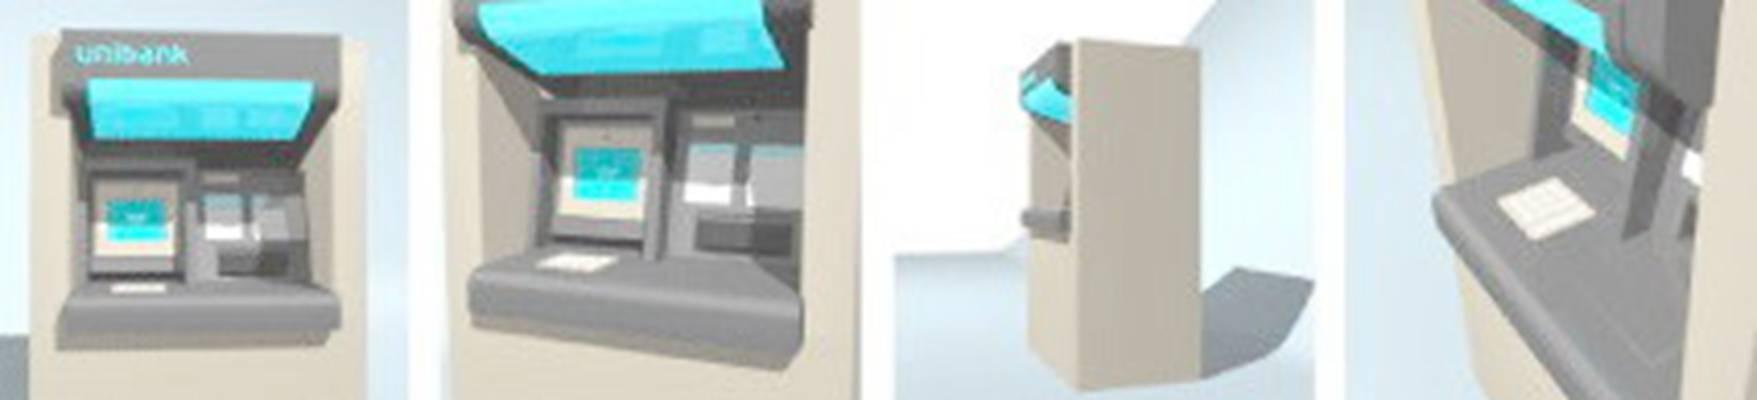 ATM取款机13D模型【ID:417360337】